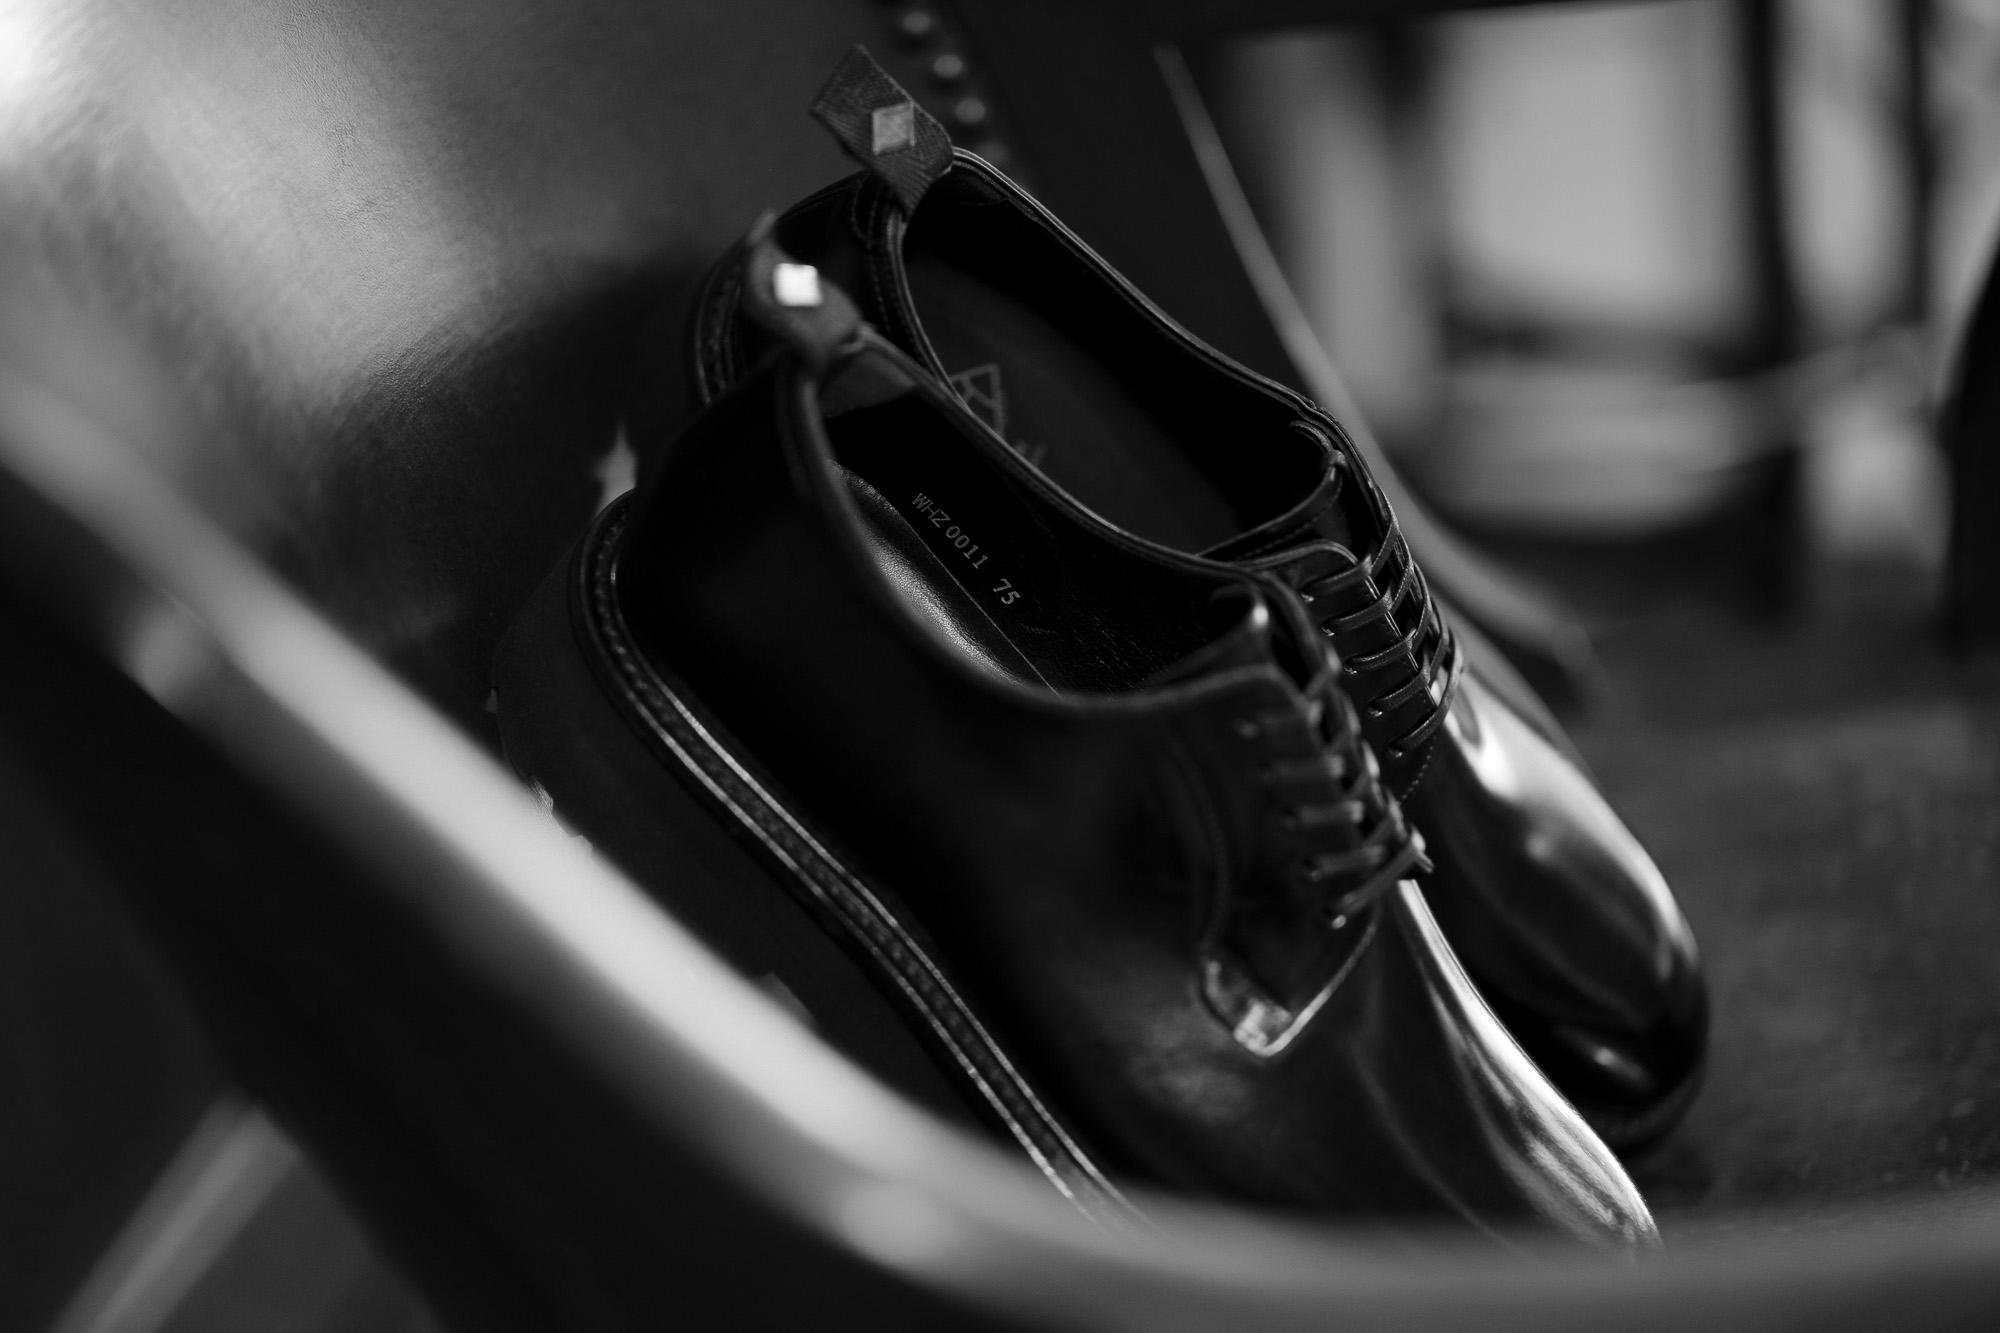 WH (ダブルエイチ) WHZ-0011 Cordovan Plane Toe Shoes (干場氏 スペシャル Zモデル) Trench Last (トレンチラスト) Shell Cordovan シェルコードバンレザー プレーントゥシューズ BLACK (ブラック) MADE IN JAPAN (日本製) 2019 秋冬 【Special限定モデル】【2019年12月発売分】【ご予約受付開始】愛知 名古屋 alto e diritto altoediritto アルトエデリット 干場義雅 干場さん